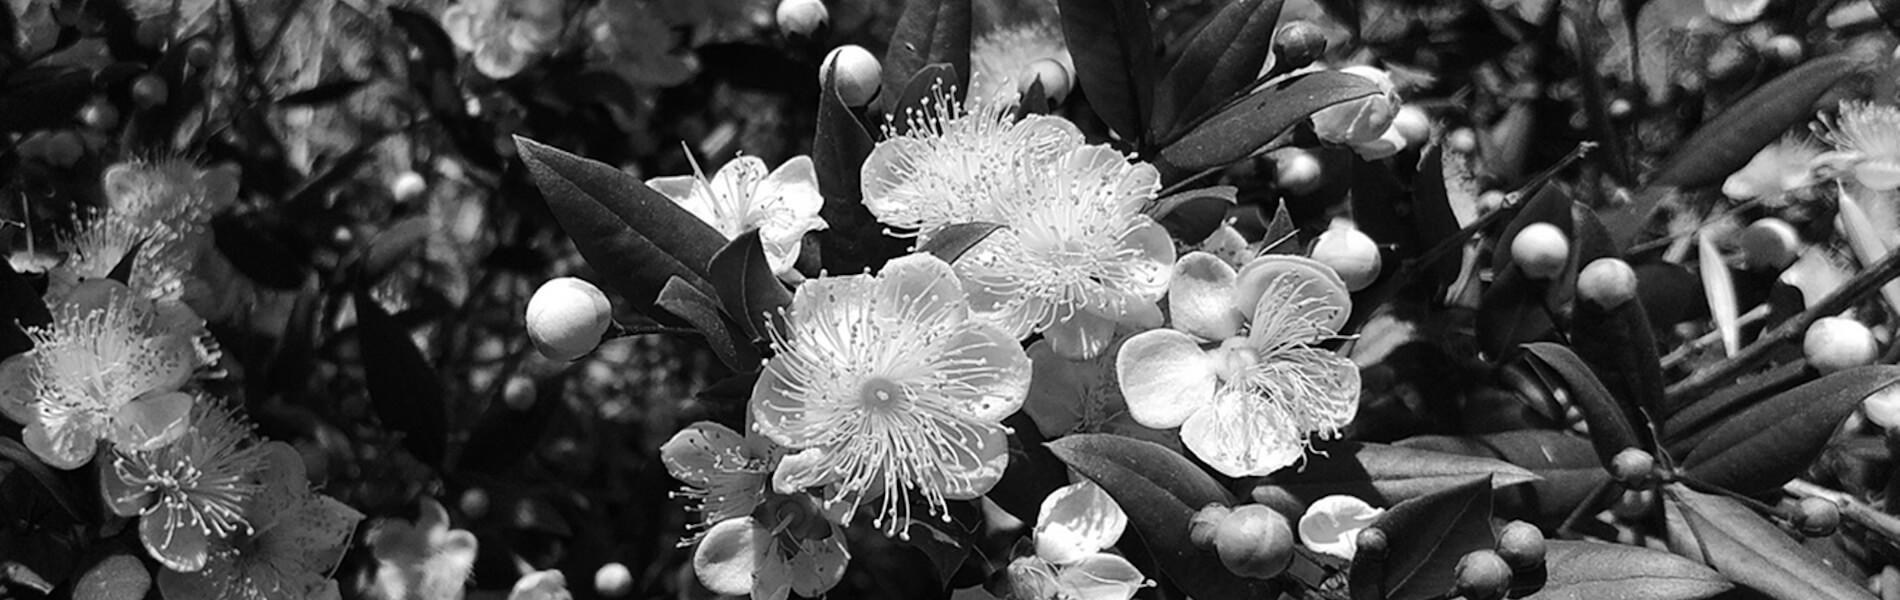 fleurs n&b